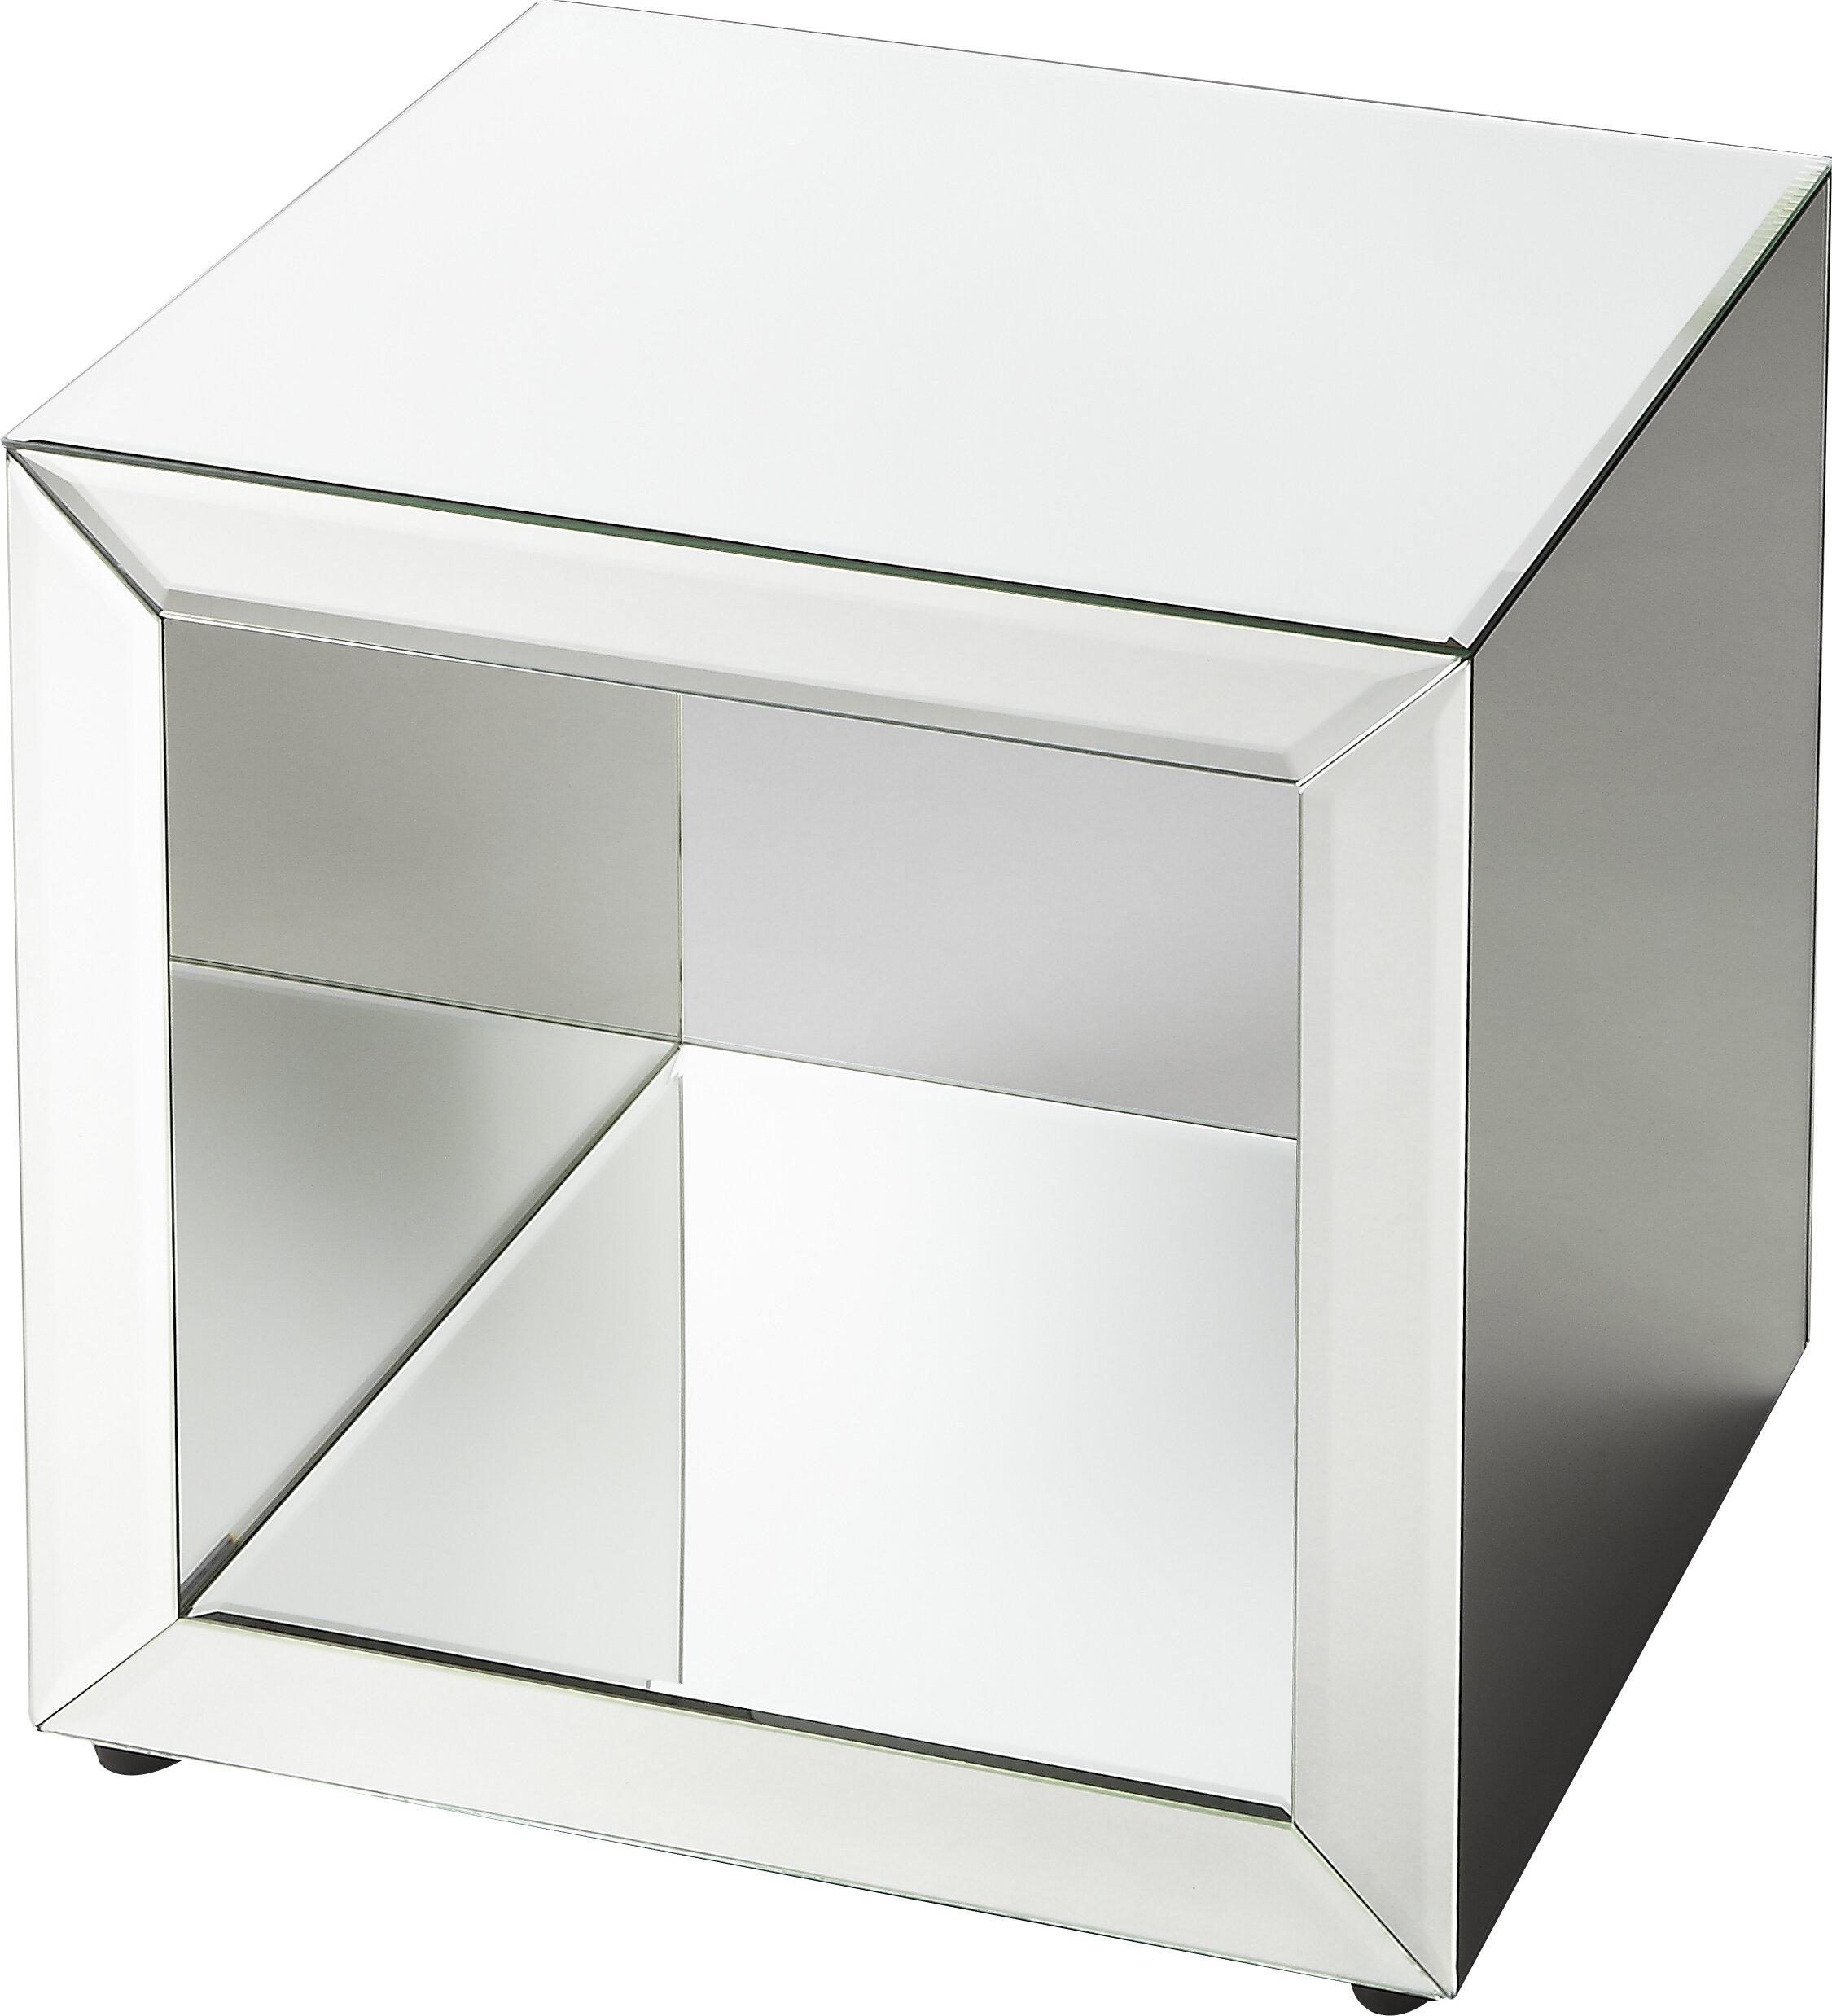 Mercer41 Seraphin Mirrored Cube End Table | Wayfair